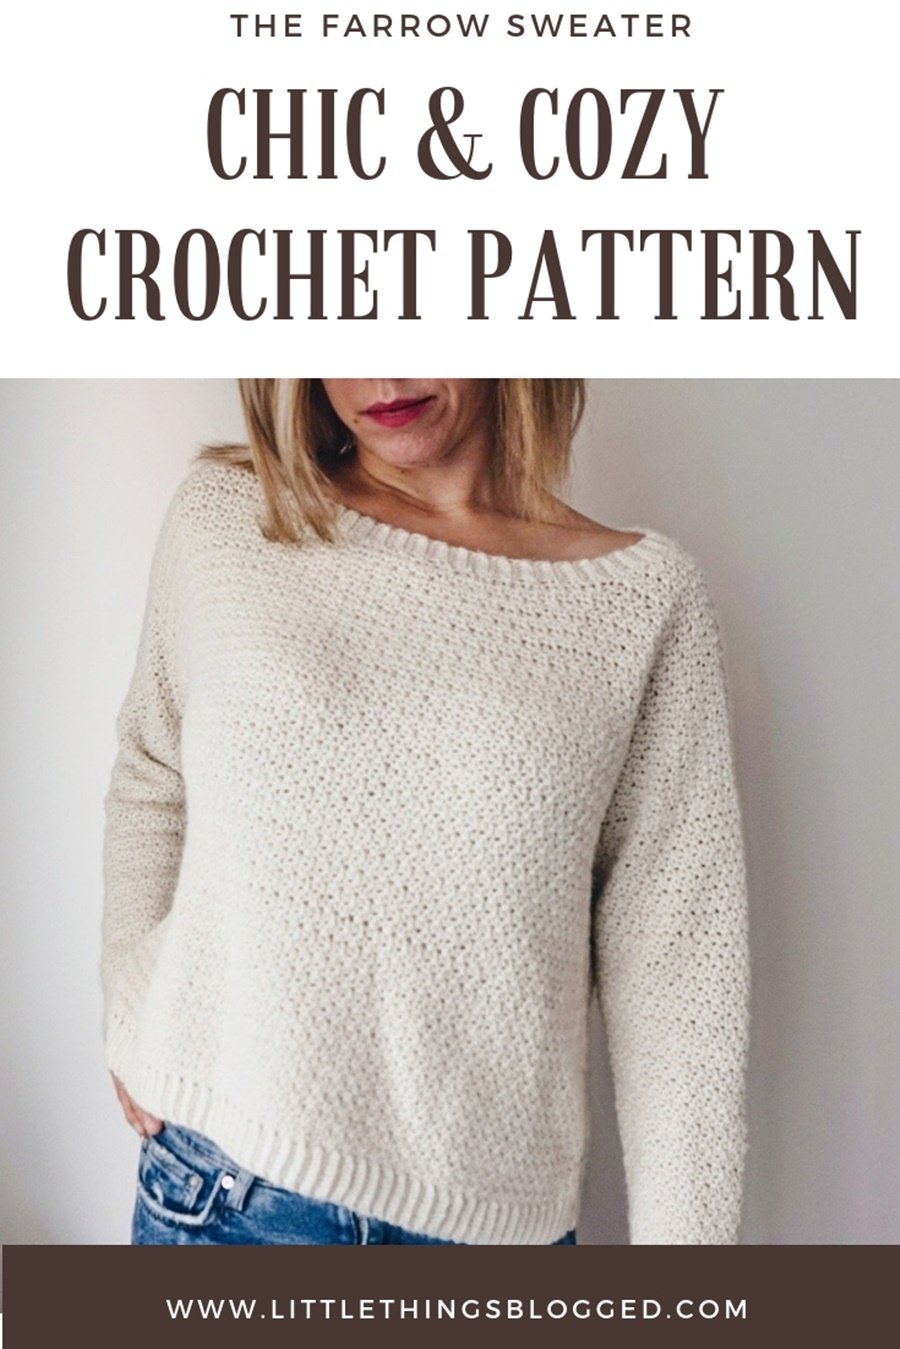 faroow sweater pinterest.jpg